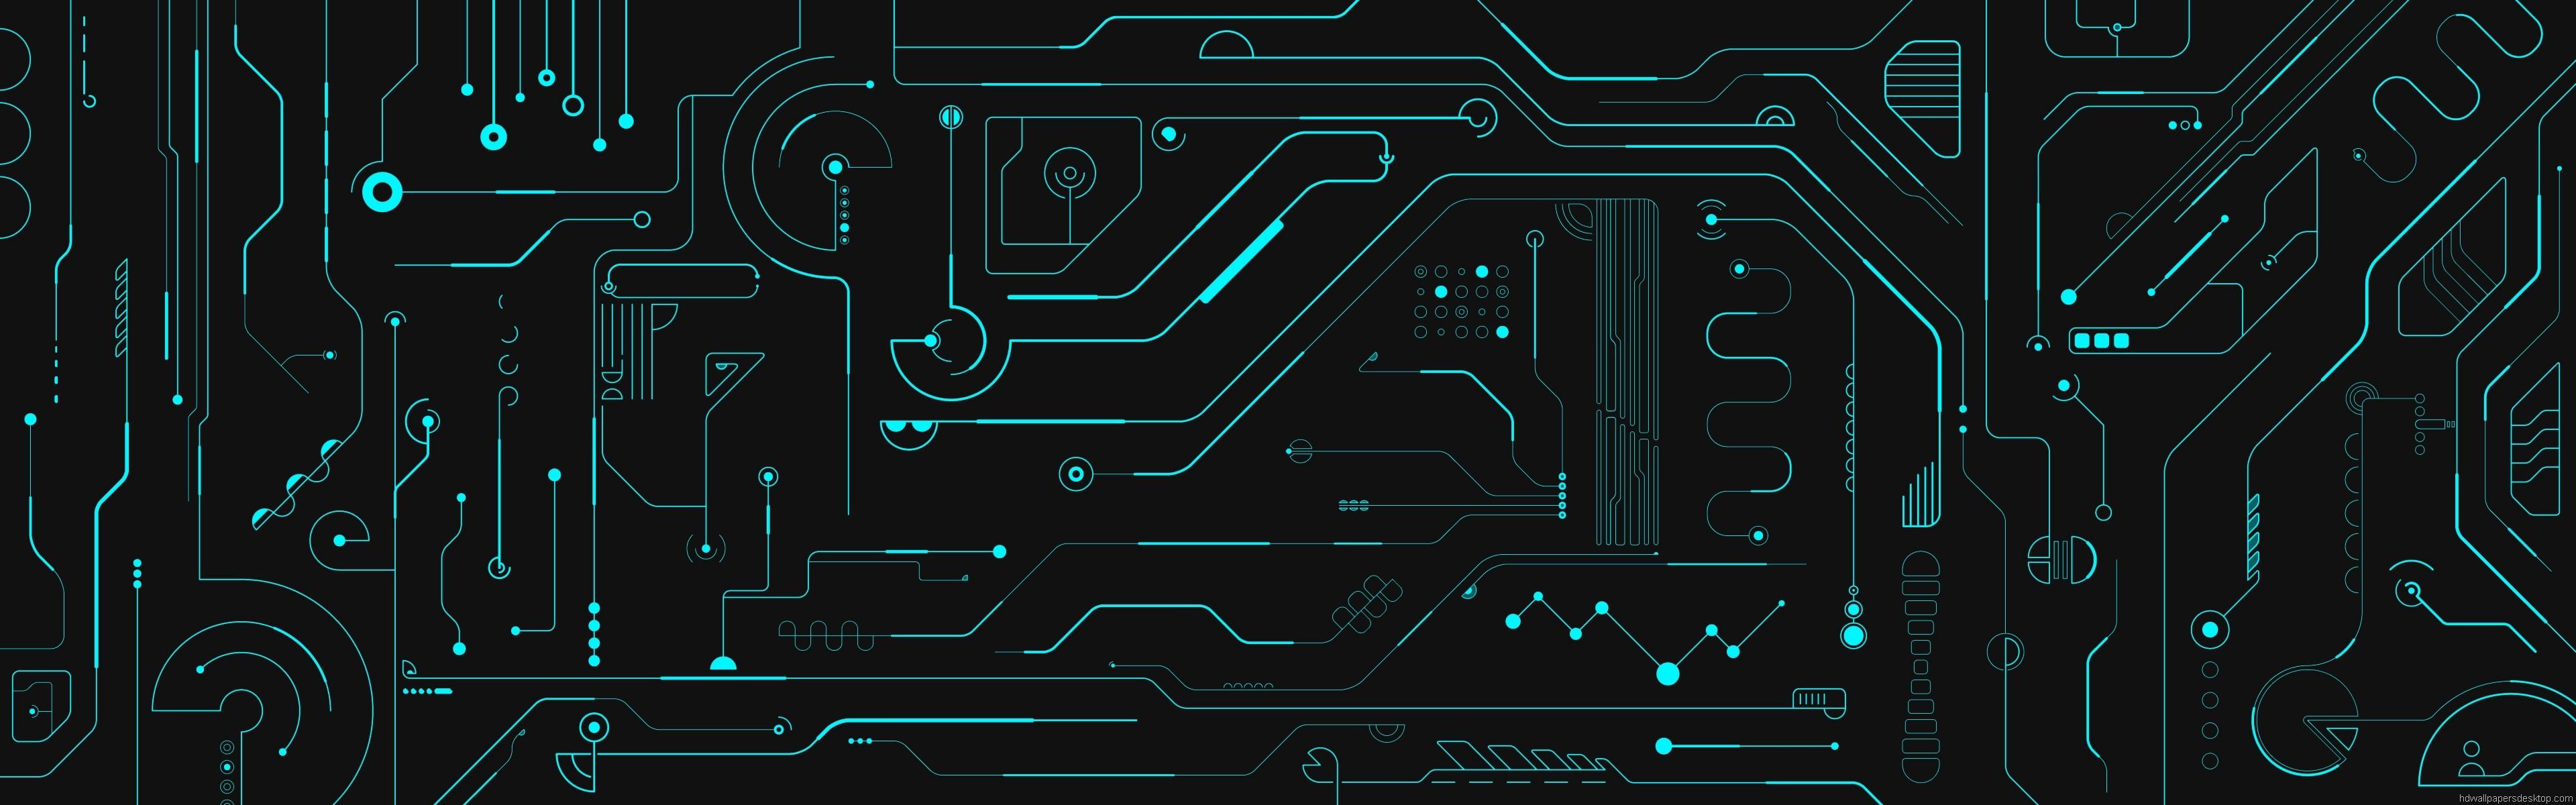 dual screen wallpaper – www.wallpapers-in-hd.com